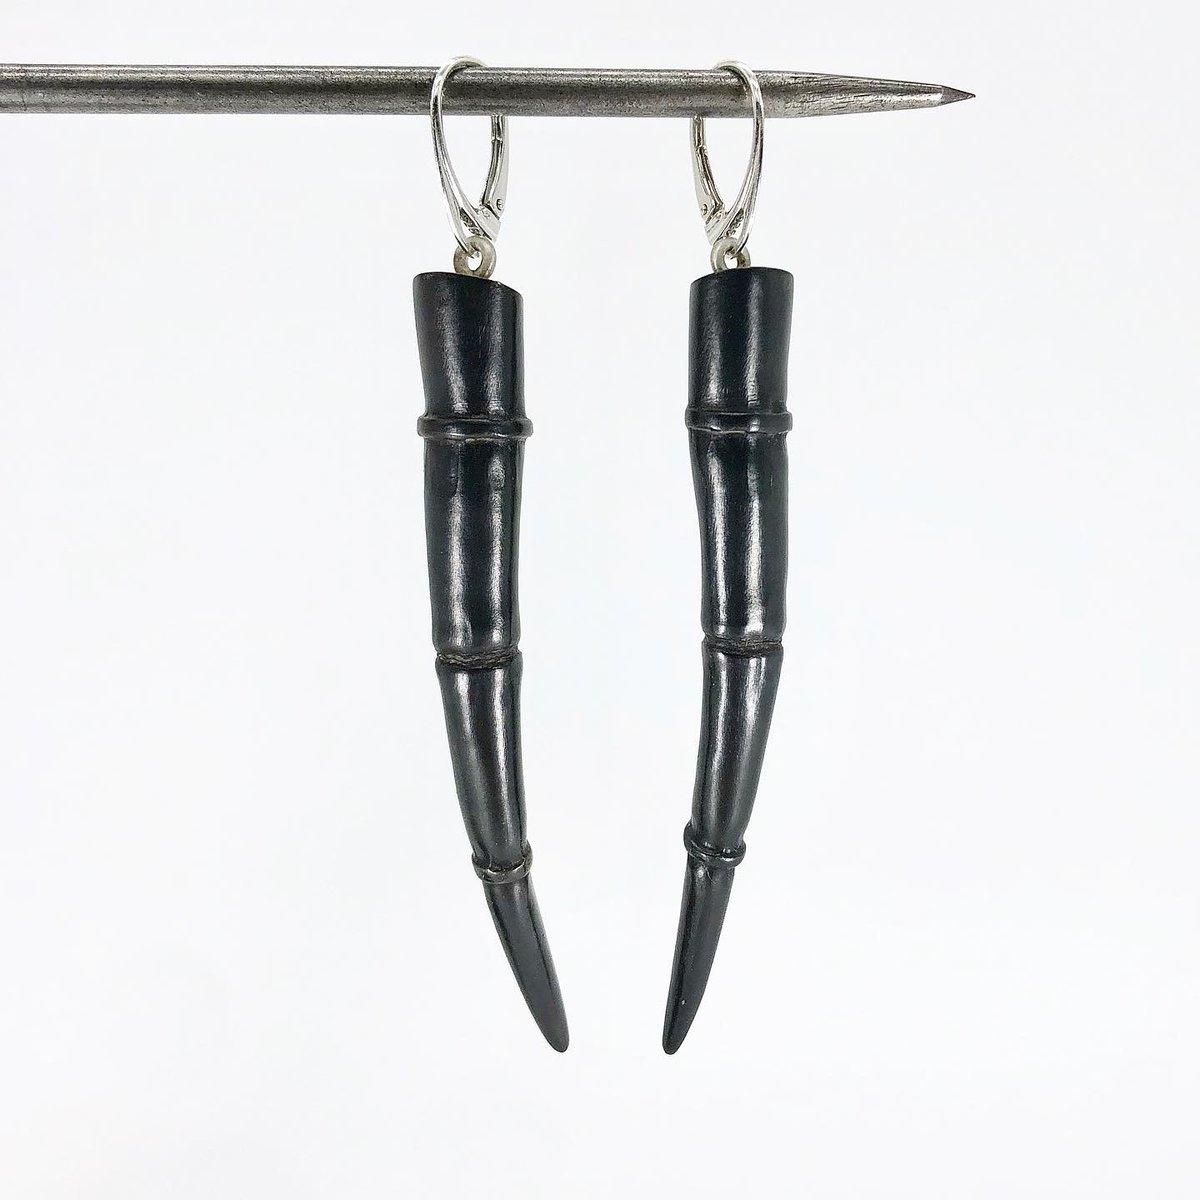 Image of Tendril Earrings, Black #10